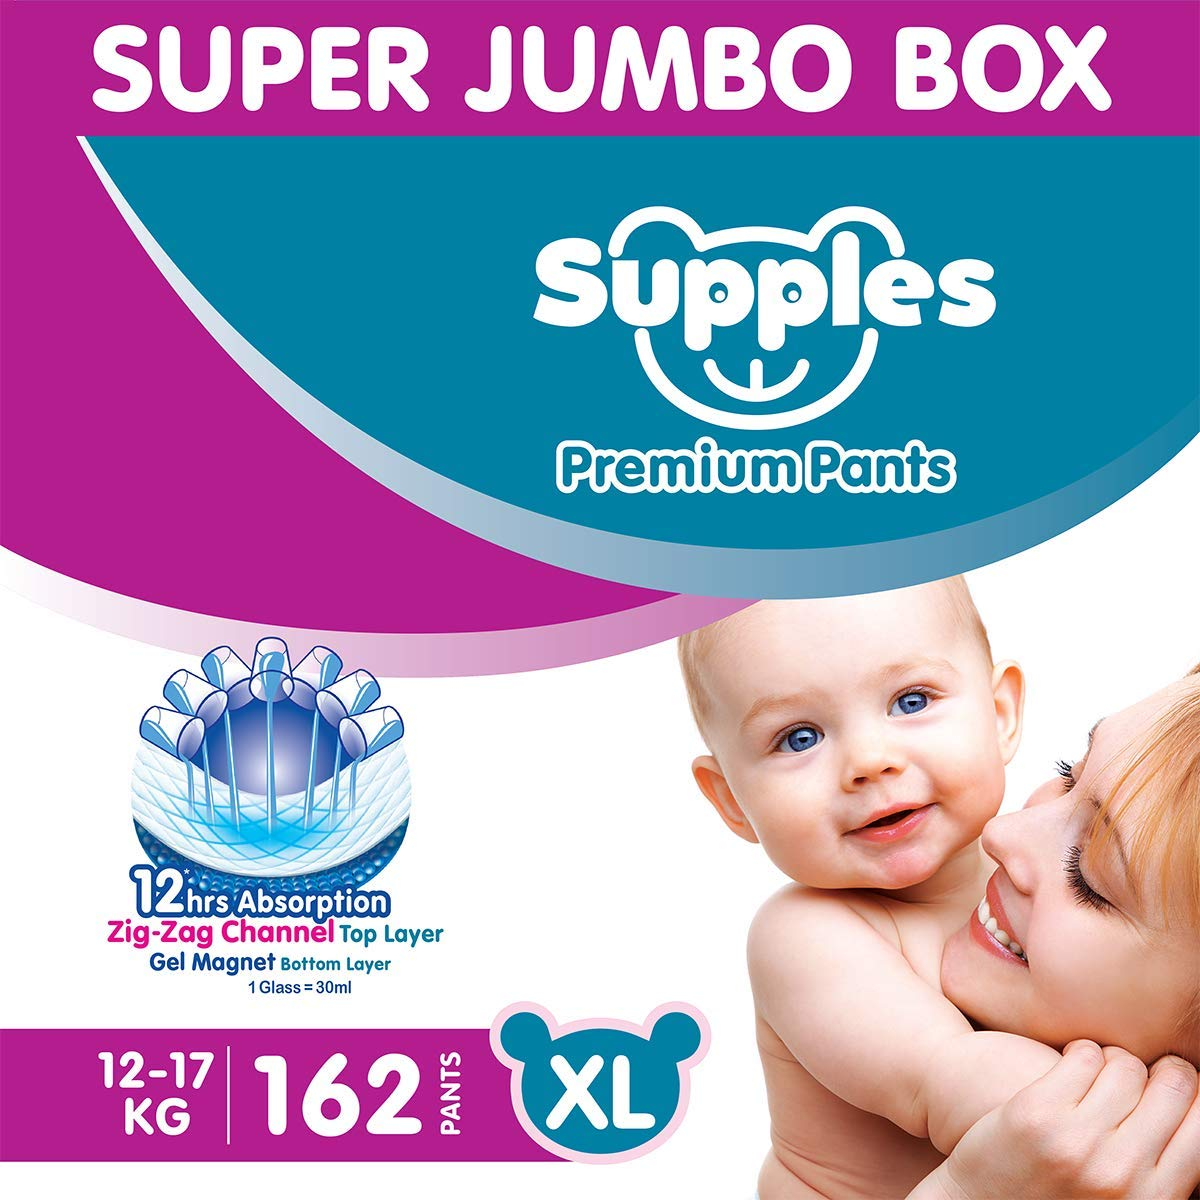 Supples Baby Diaper Pants XL Pack of 3 Super Jumbo Box (162 Piece)